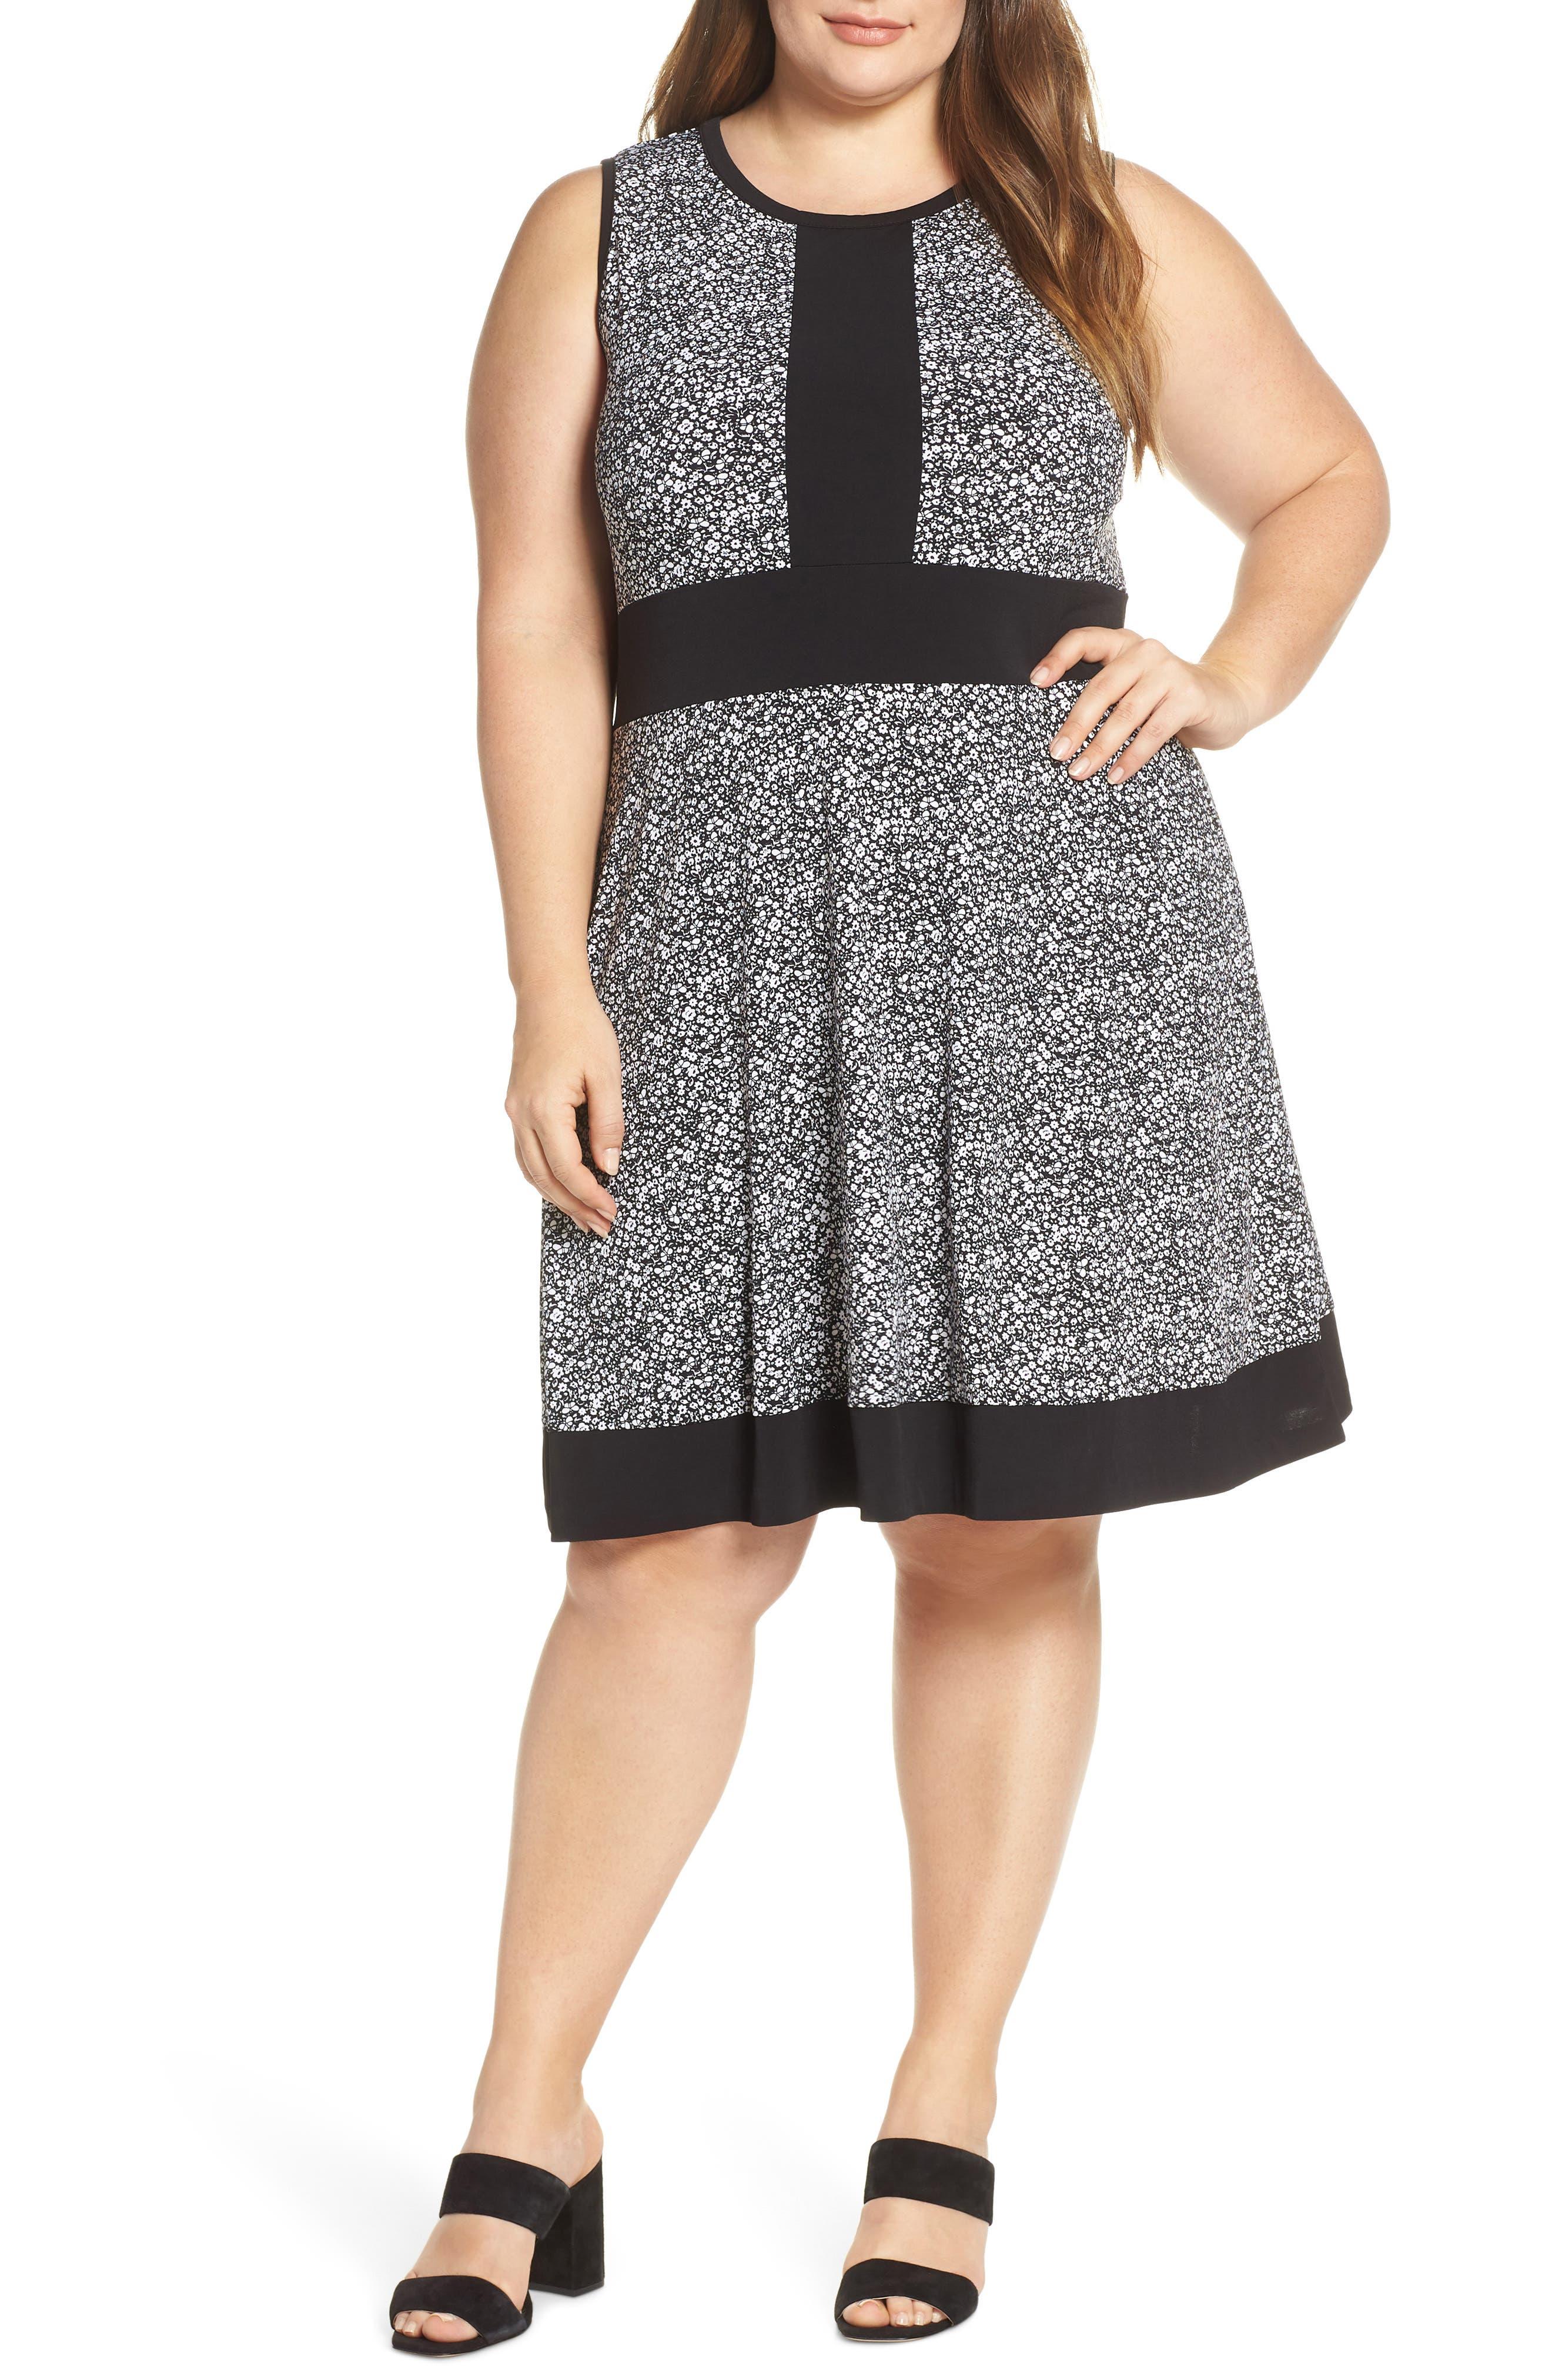 MICHAEL MICHAEL KORS, Spring Twist Dress, Main thumbnail 1, color, BLACK/ WHITE